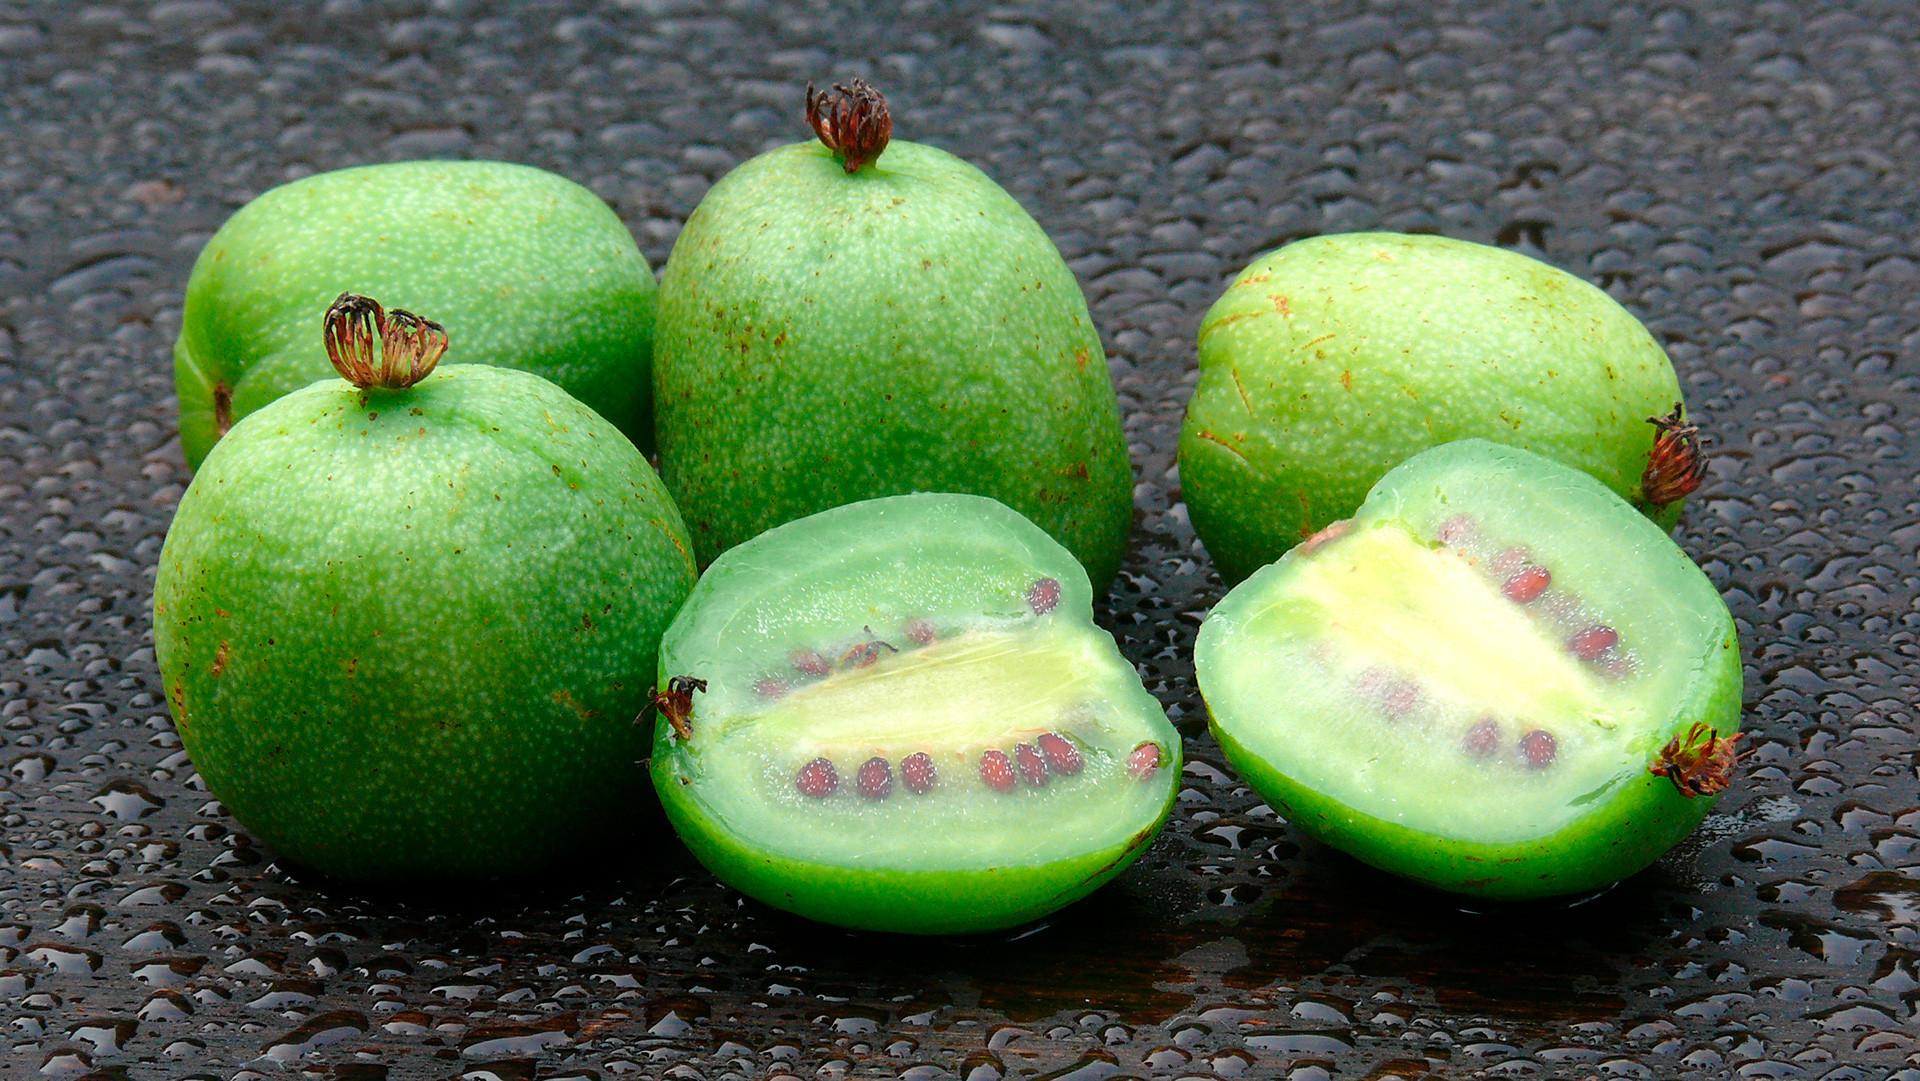 Actinidia looks like a small kiwi fruit.